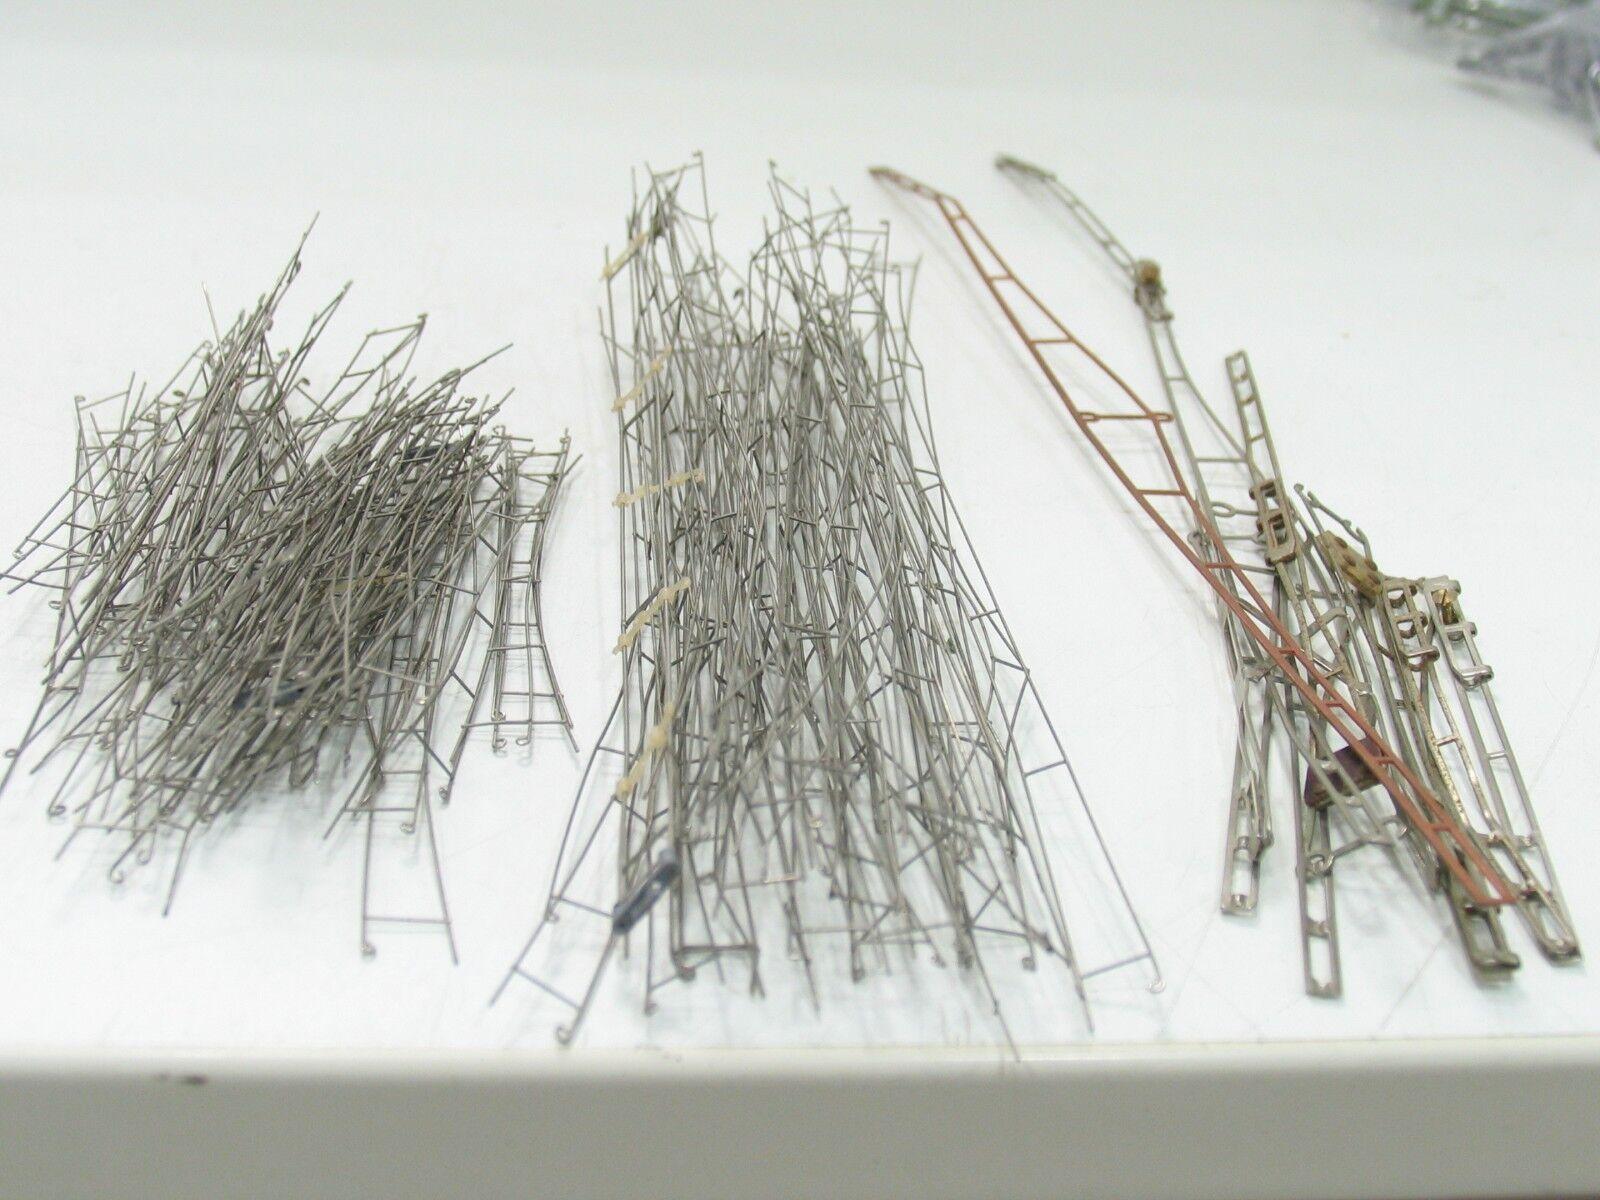 Spur HO Oberleitungs-filo Gigante-la raccolta vedere immagini nz1325